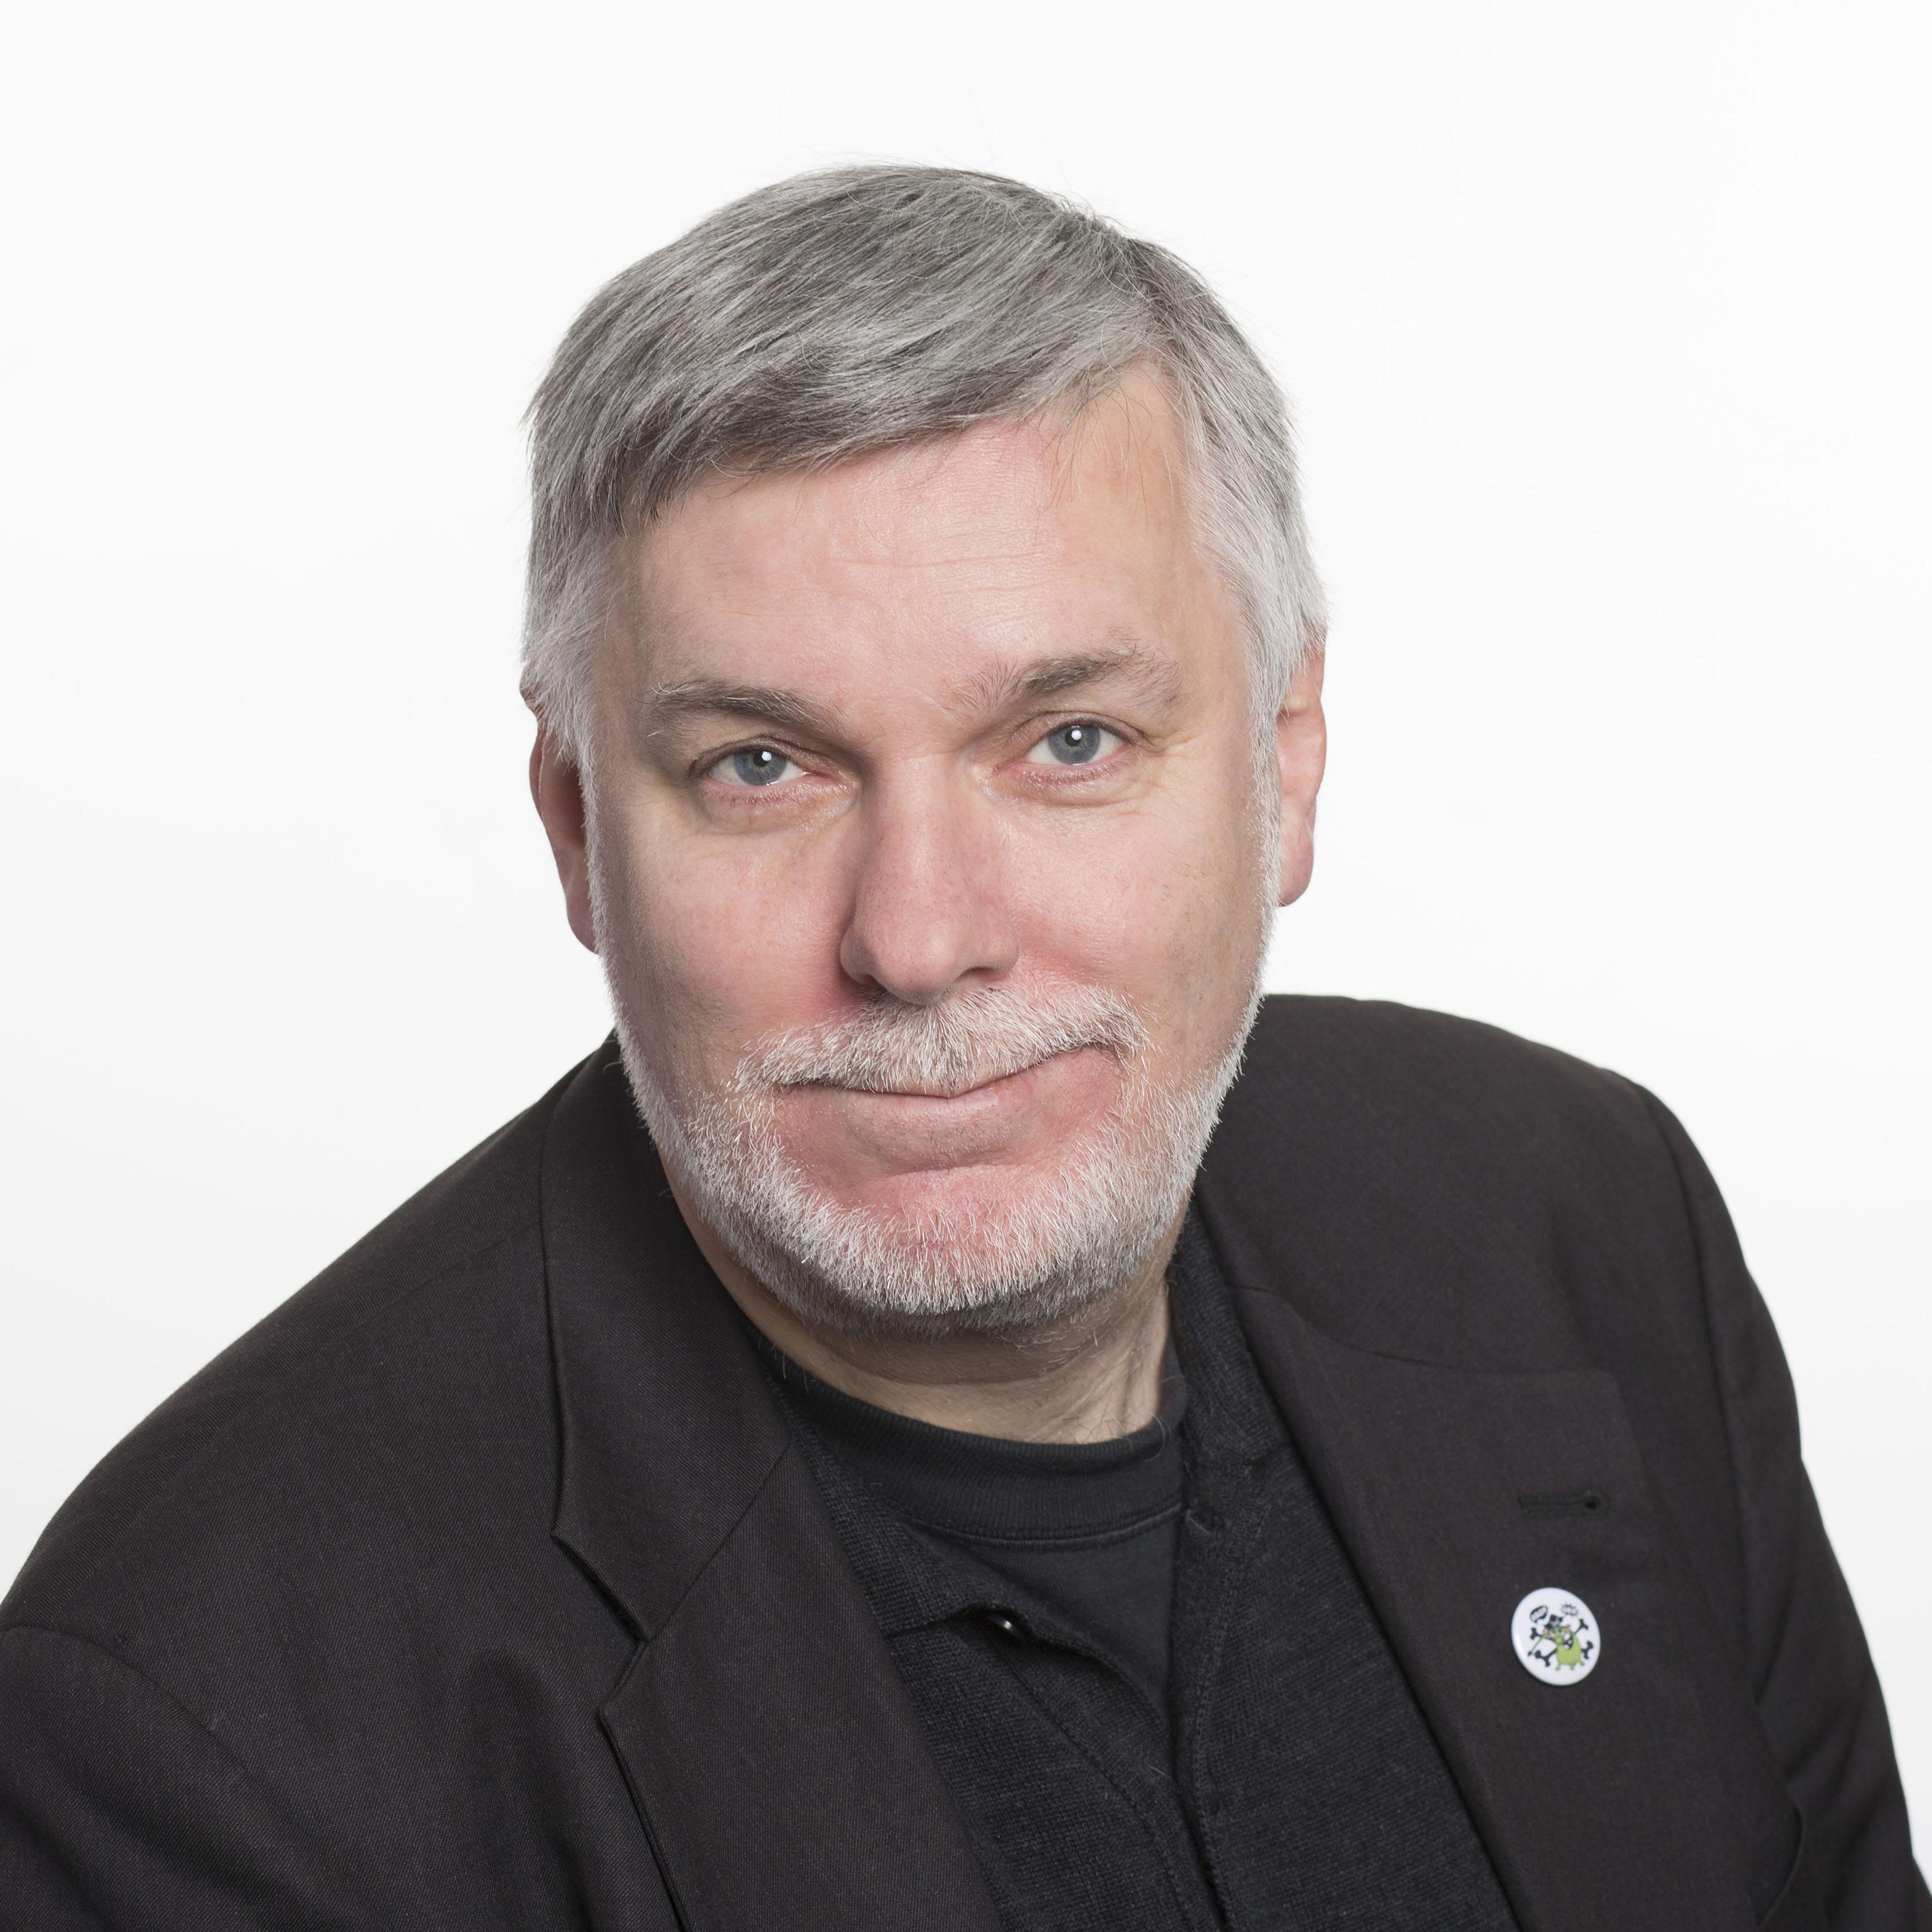 Michael Joho